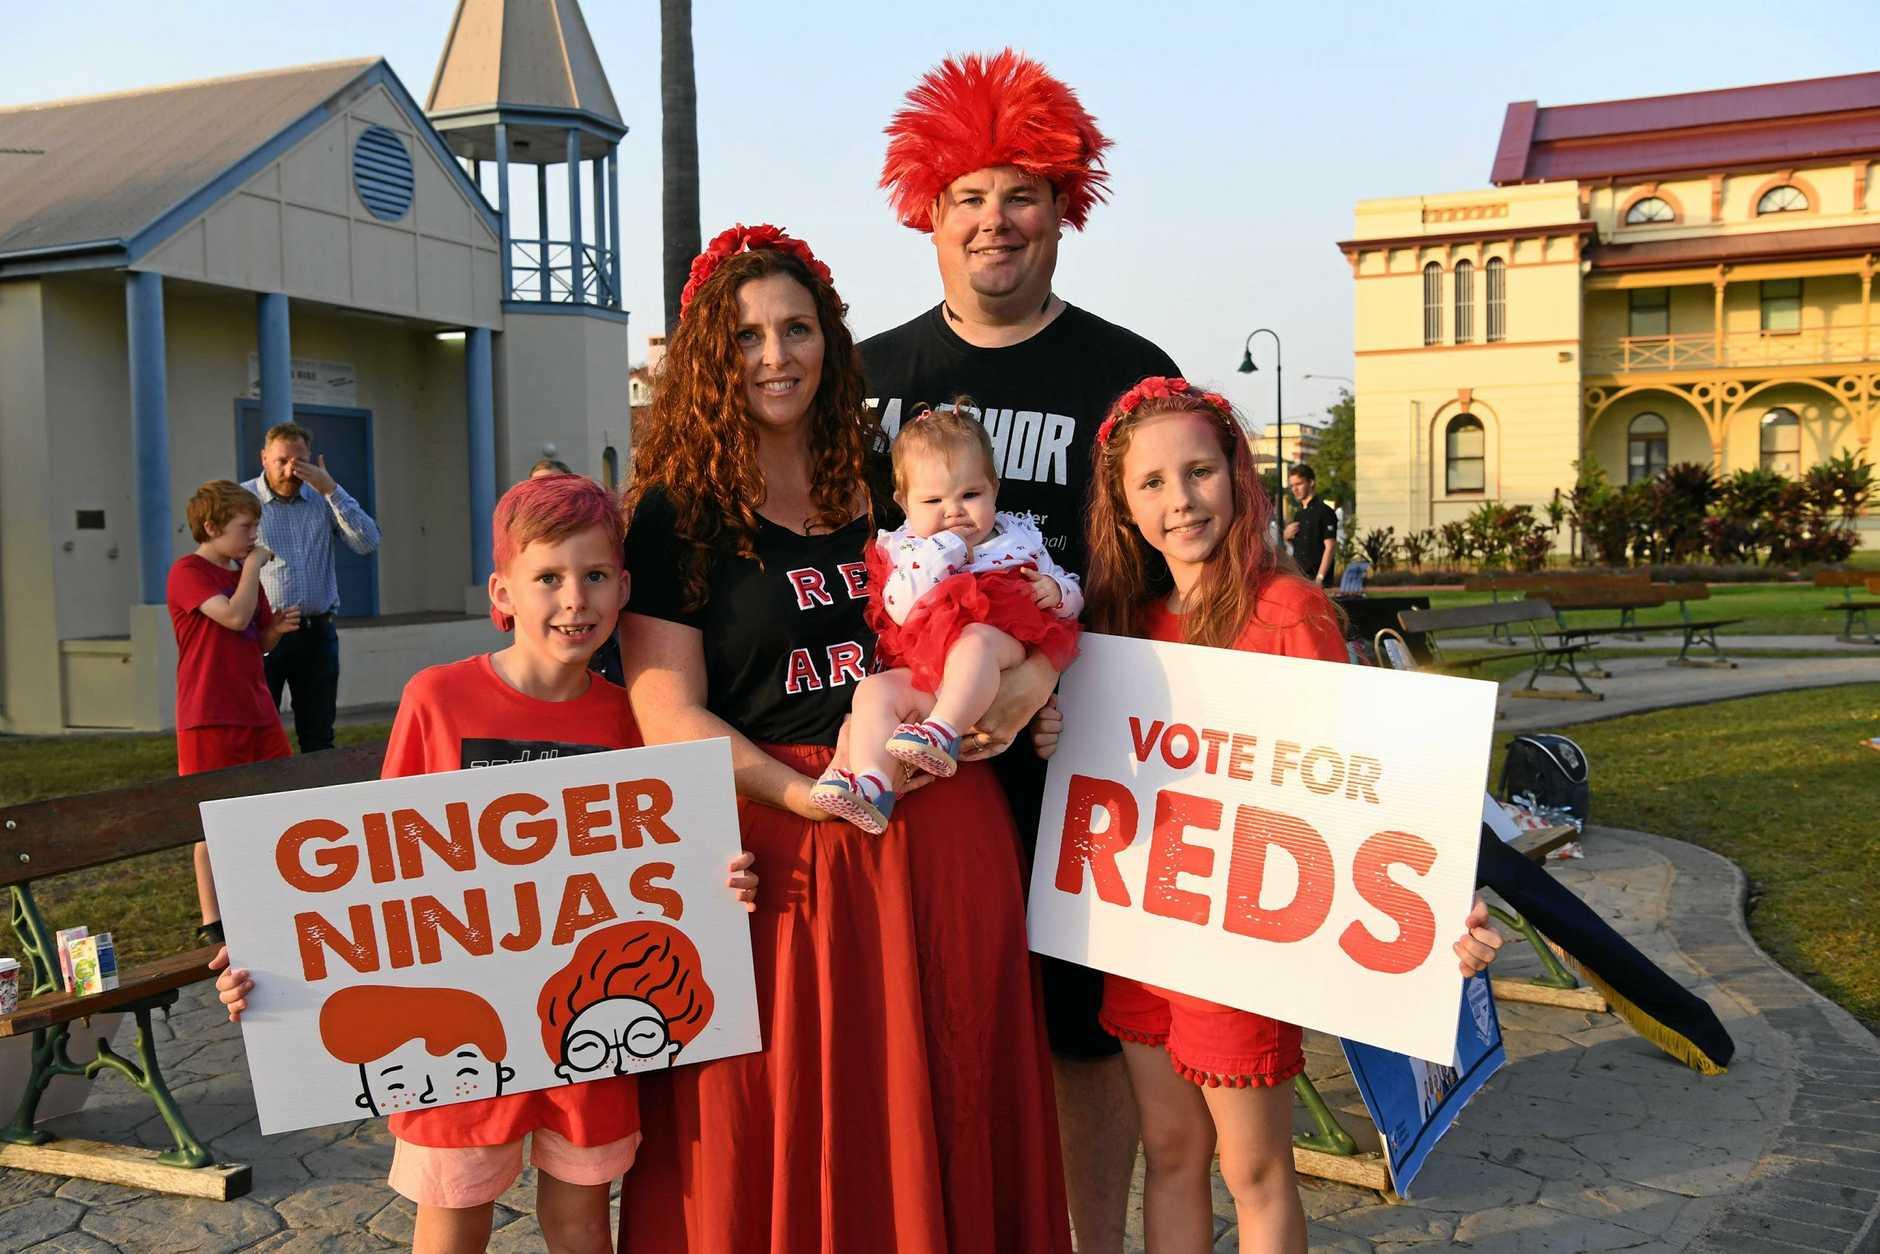 Redhead rally - (L) 7yo Jaxon Brenia, Maureen Murphy, Ayla Westlake, Brian Westlake and 9yo Cianna Brenia.